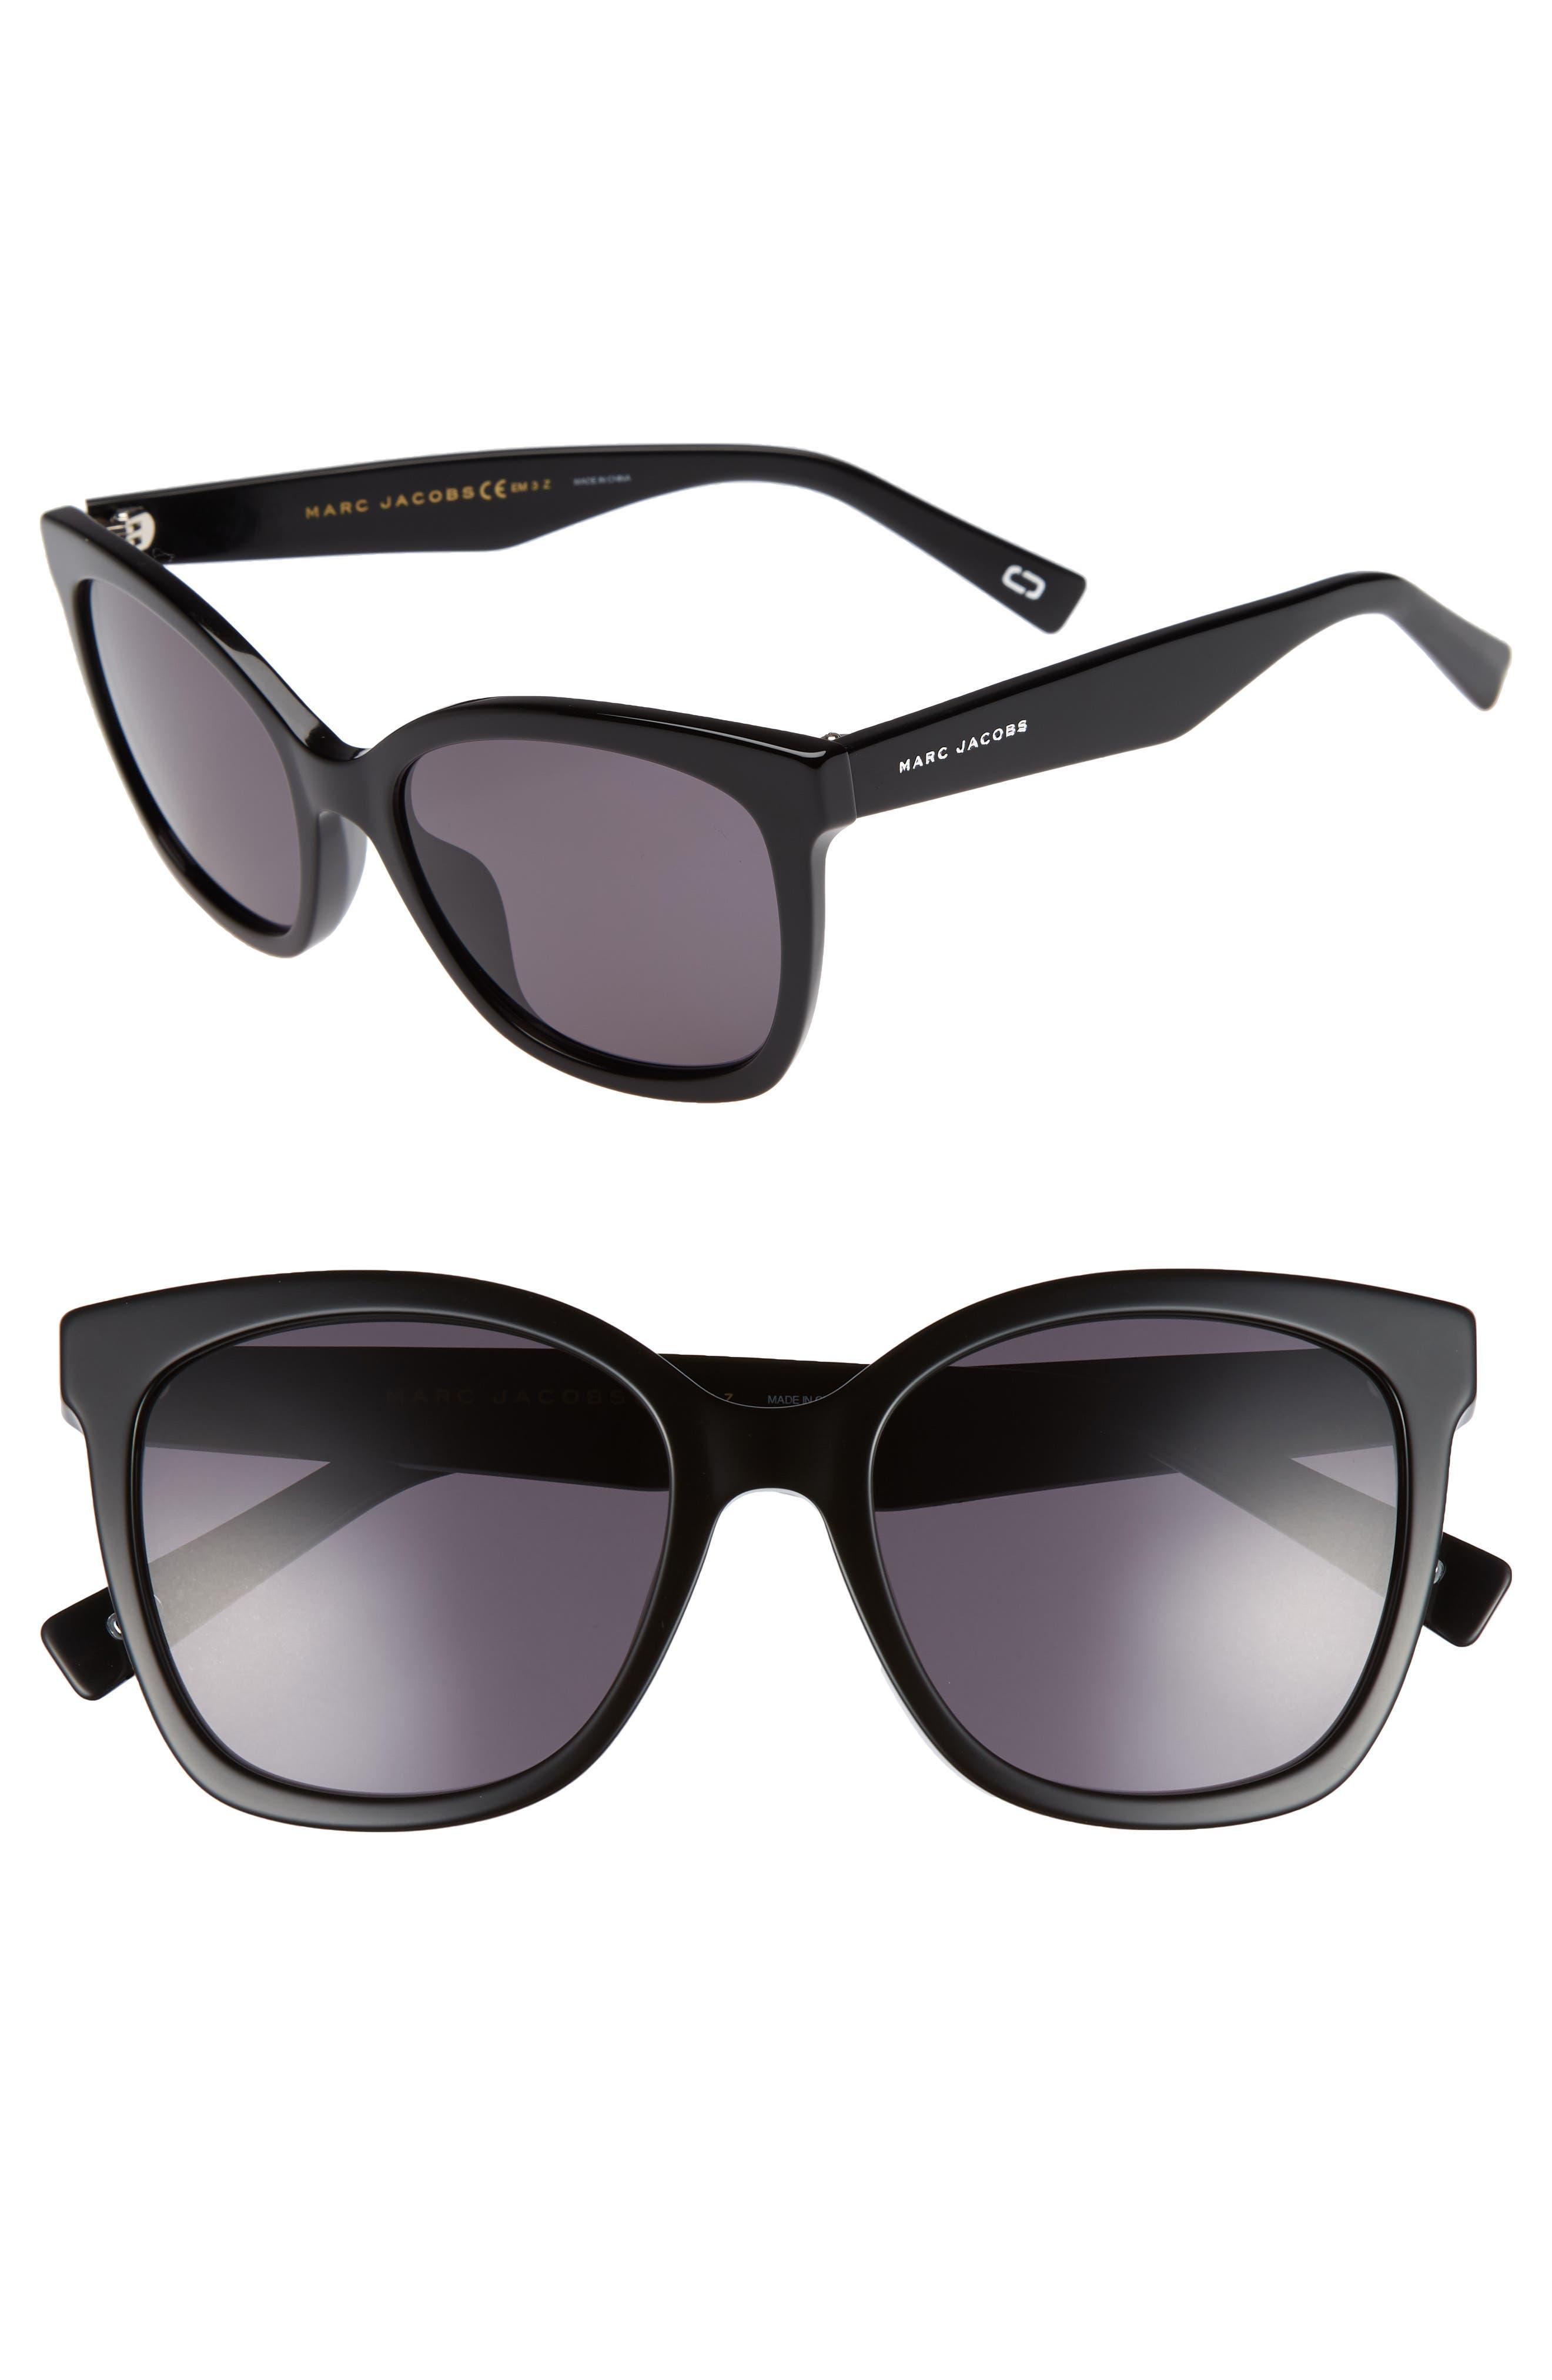 54mm Gradient Lens Sunglasses,                         Main,                         color, Black Polar